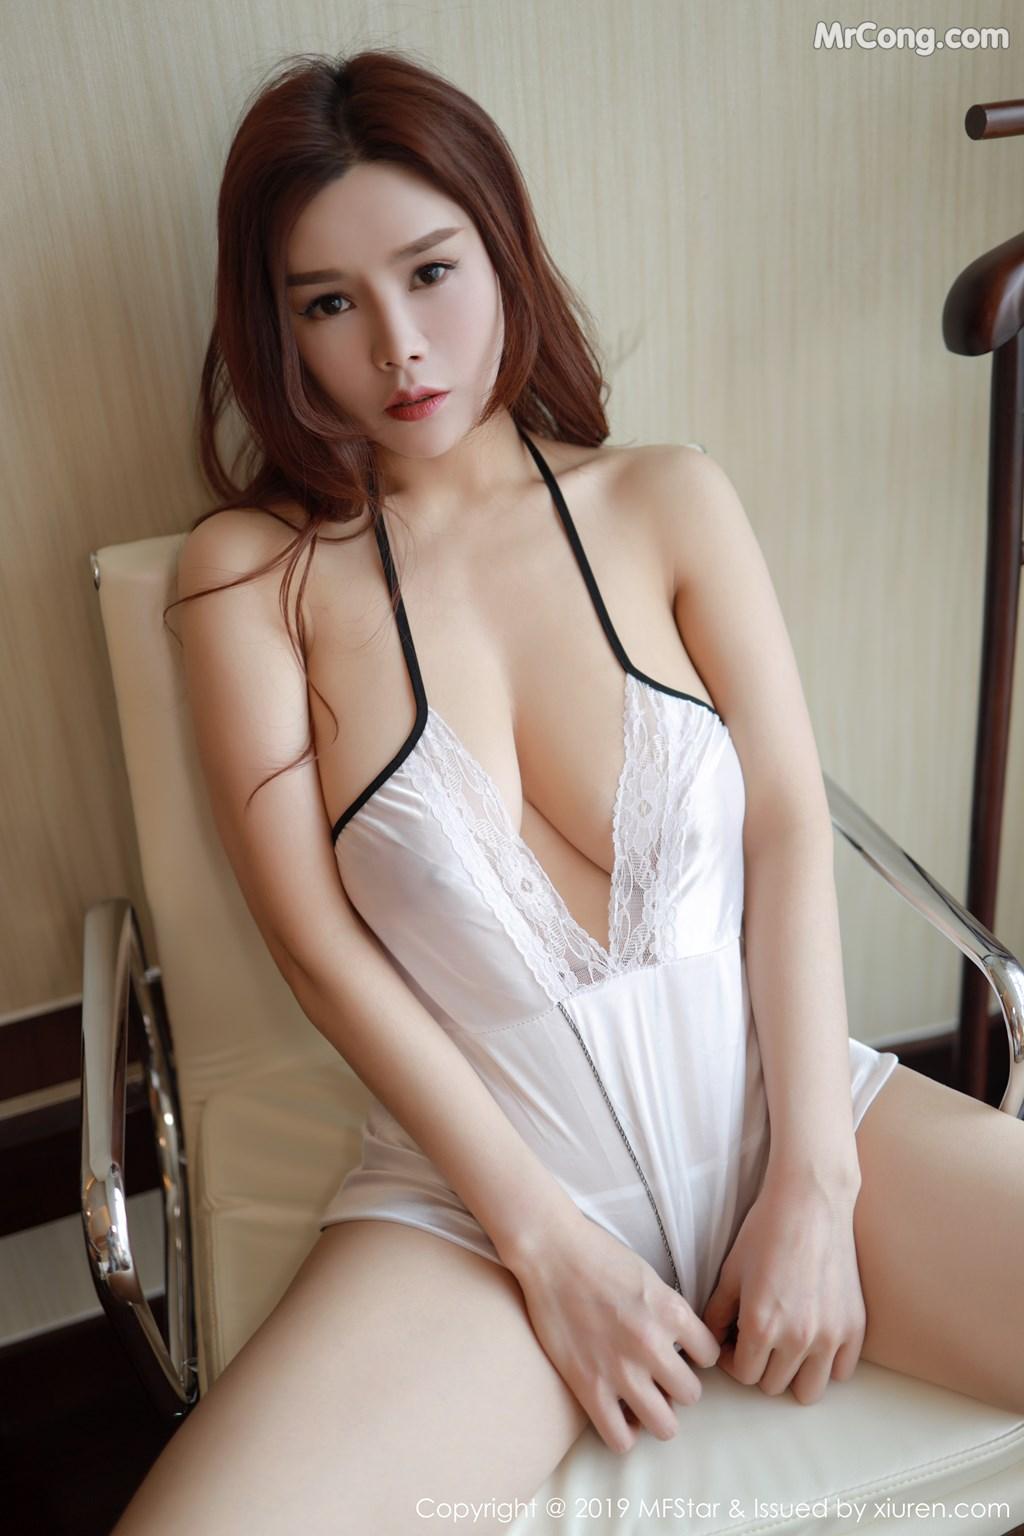 Image MFStar-Vol.185-201712-MrCong.com-002 in post MFStar Vol.185: 胡润曦201712 (41 ảnh)